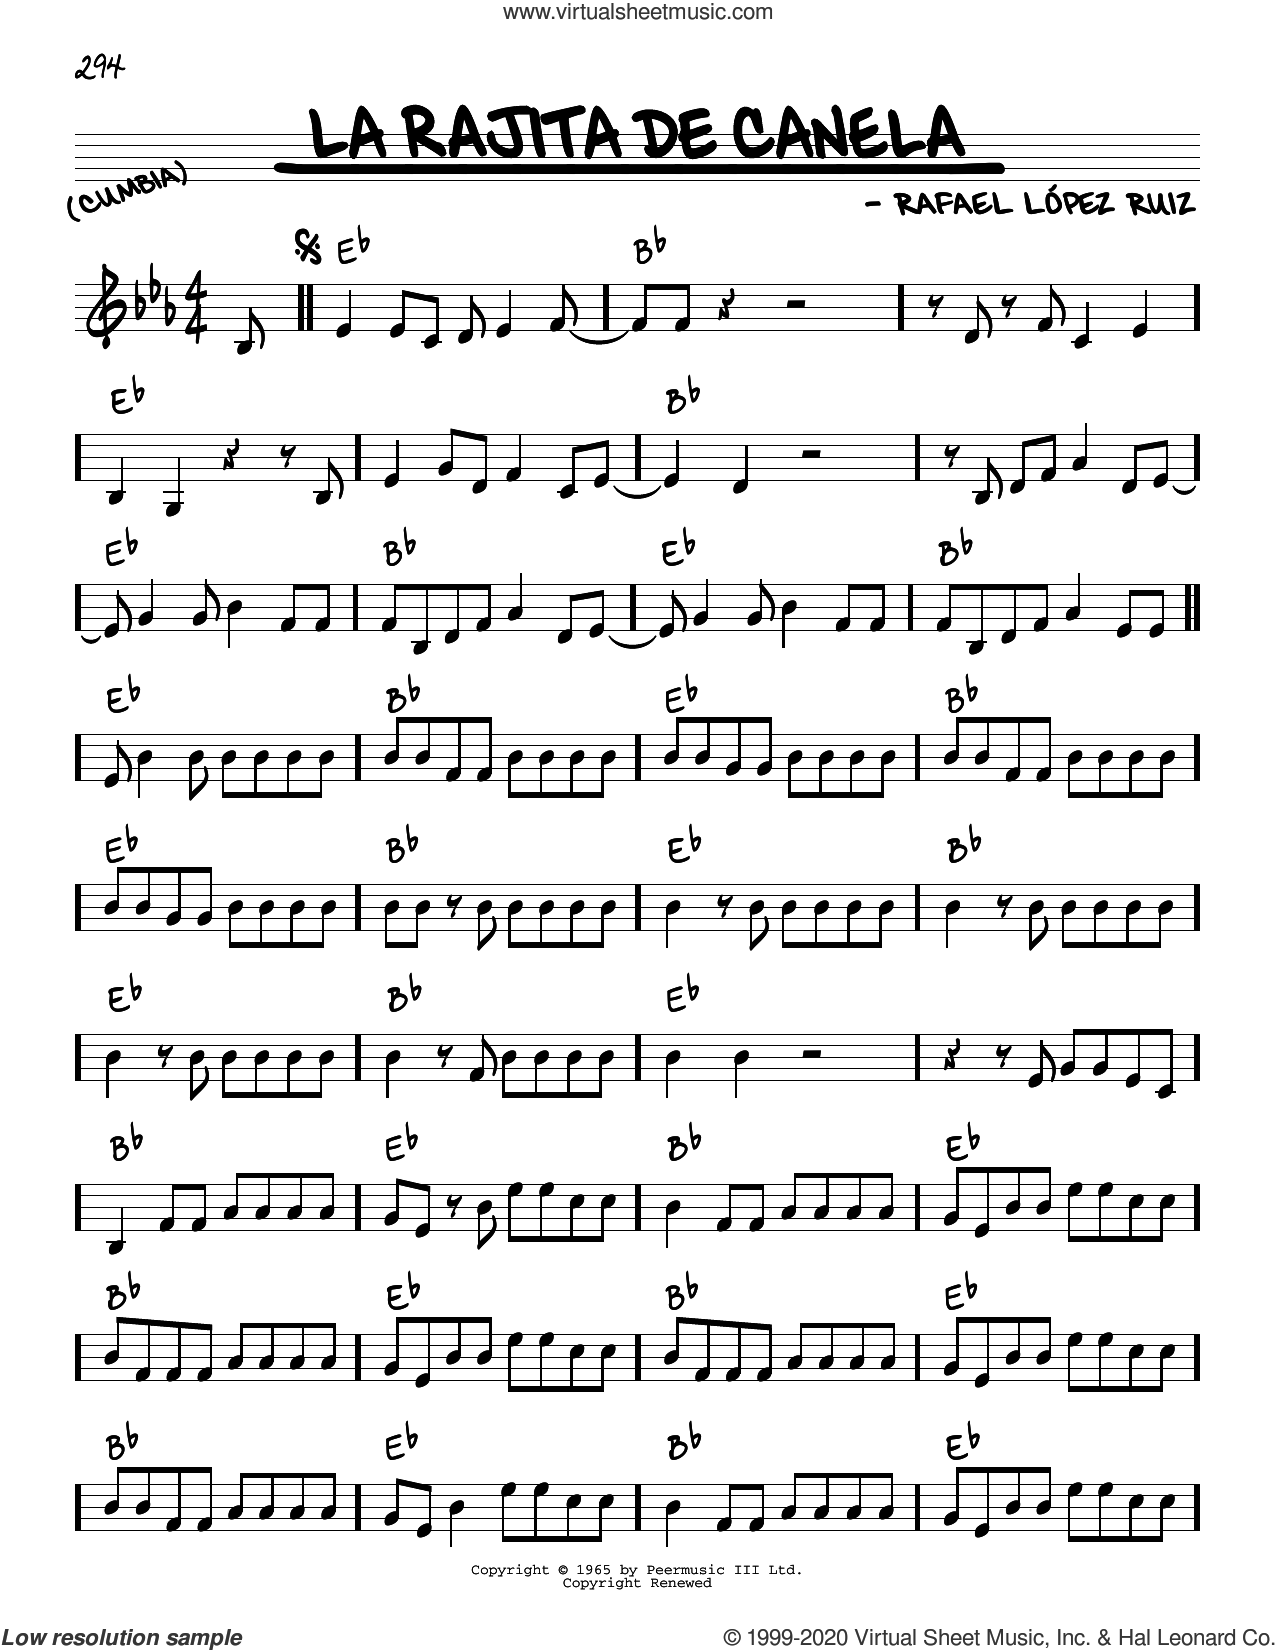 La Rajita De Canela sheet music for voice and other instruments (real book) by Rafael Lopez Ruiz, intermediate skill level